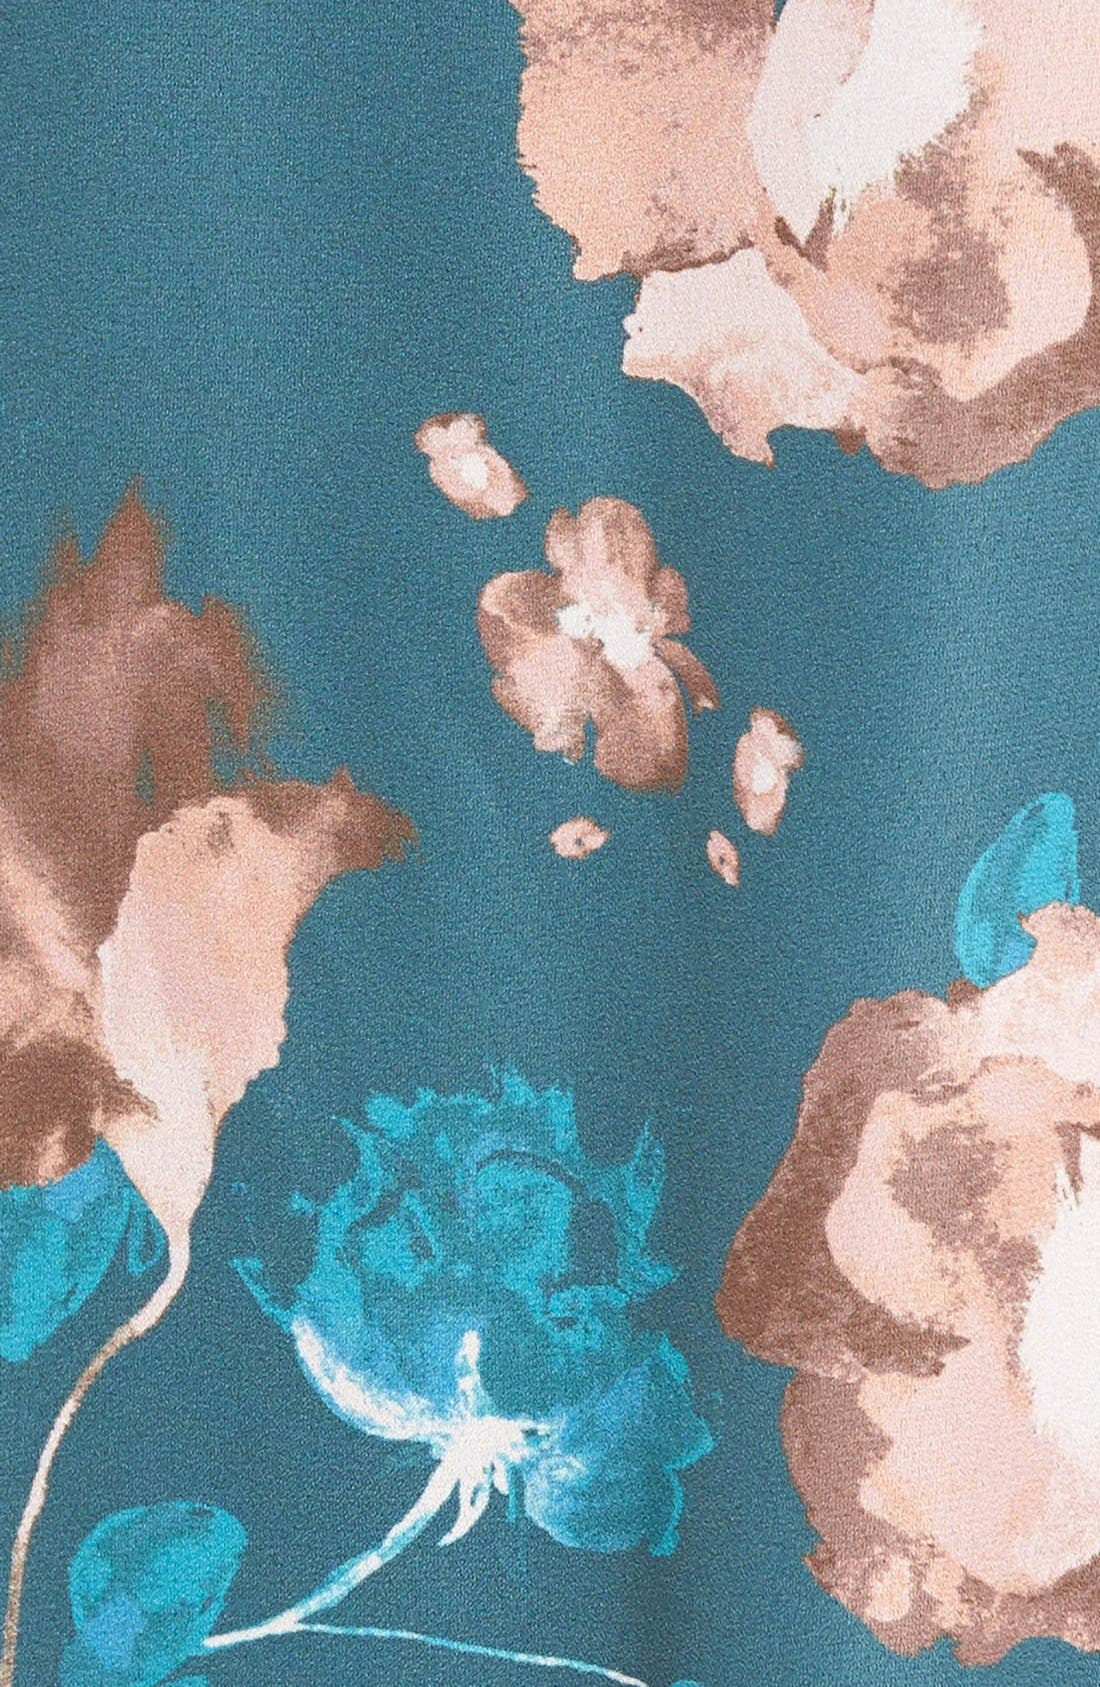 Floral Print Slipdress,                             Alternate thumbnail 5, color,                             Teal Floral Print